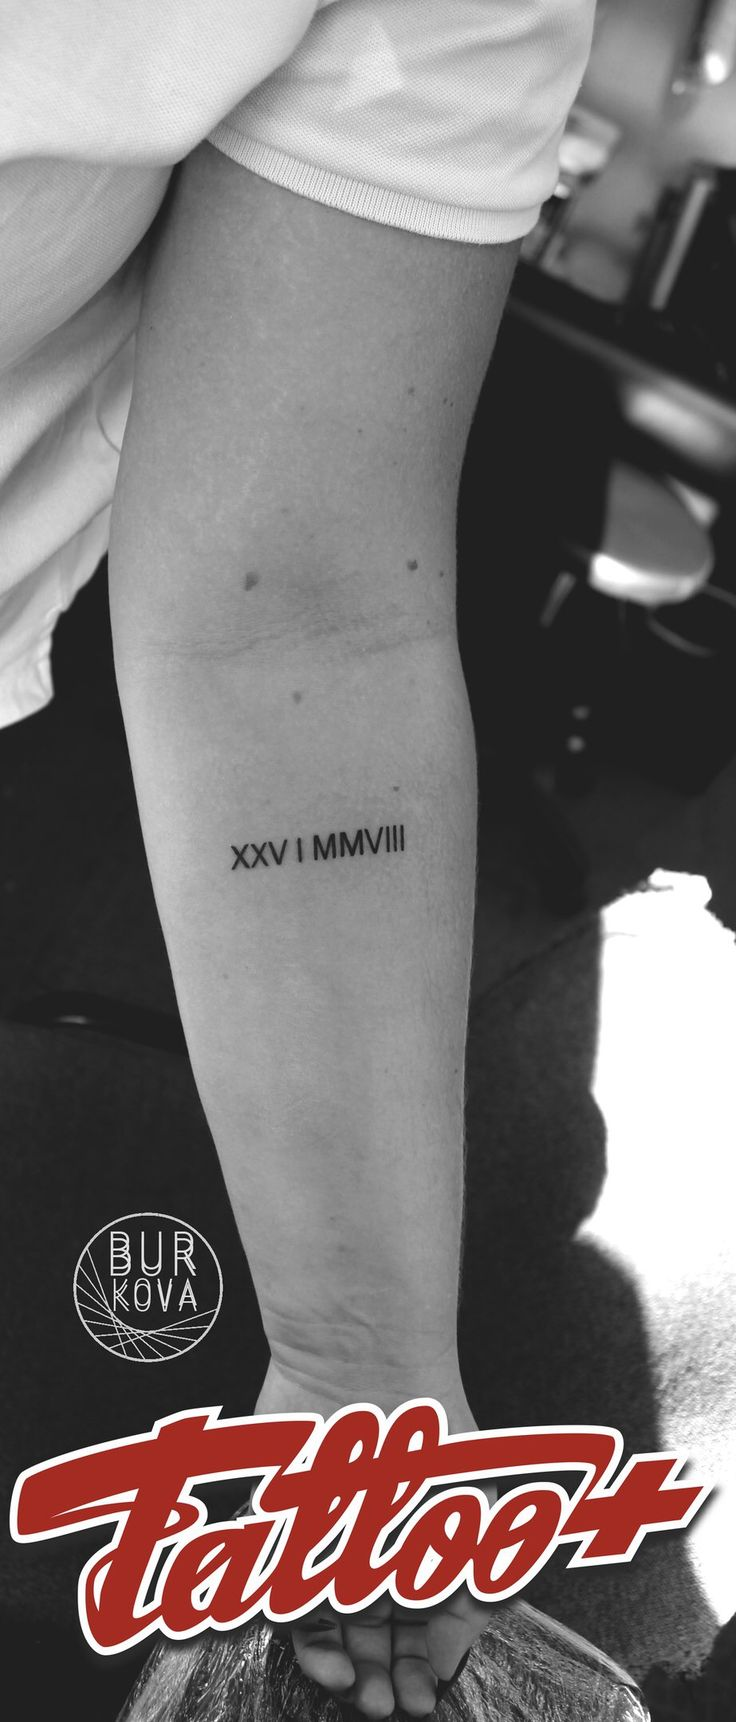 Tattoo art sketch font тату татуировка эскиз арт римские цифры лайн line linework